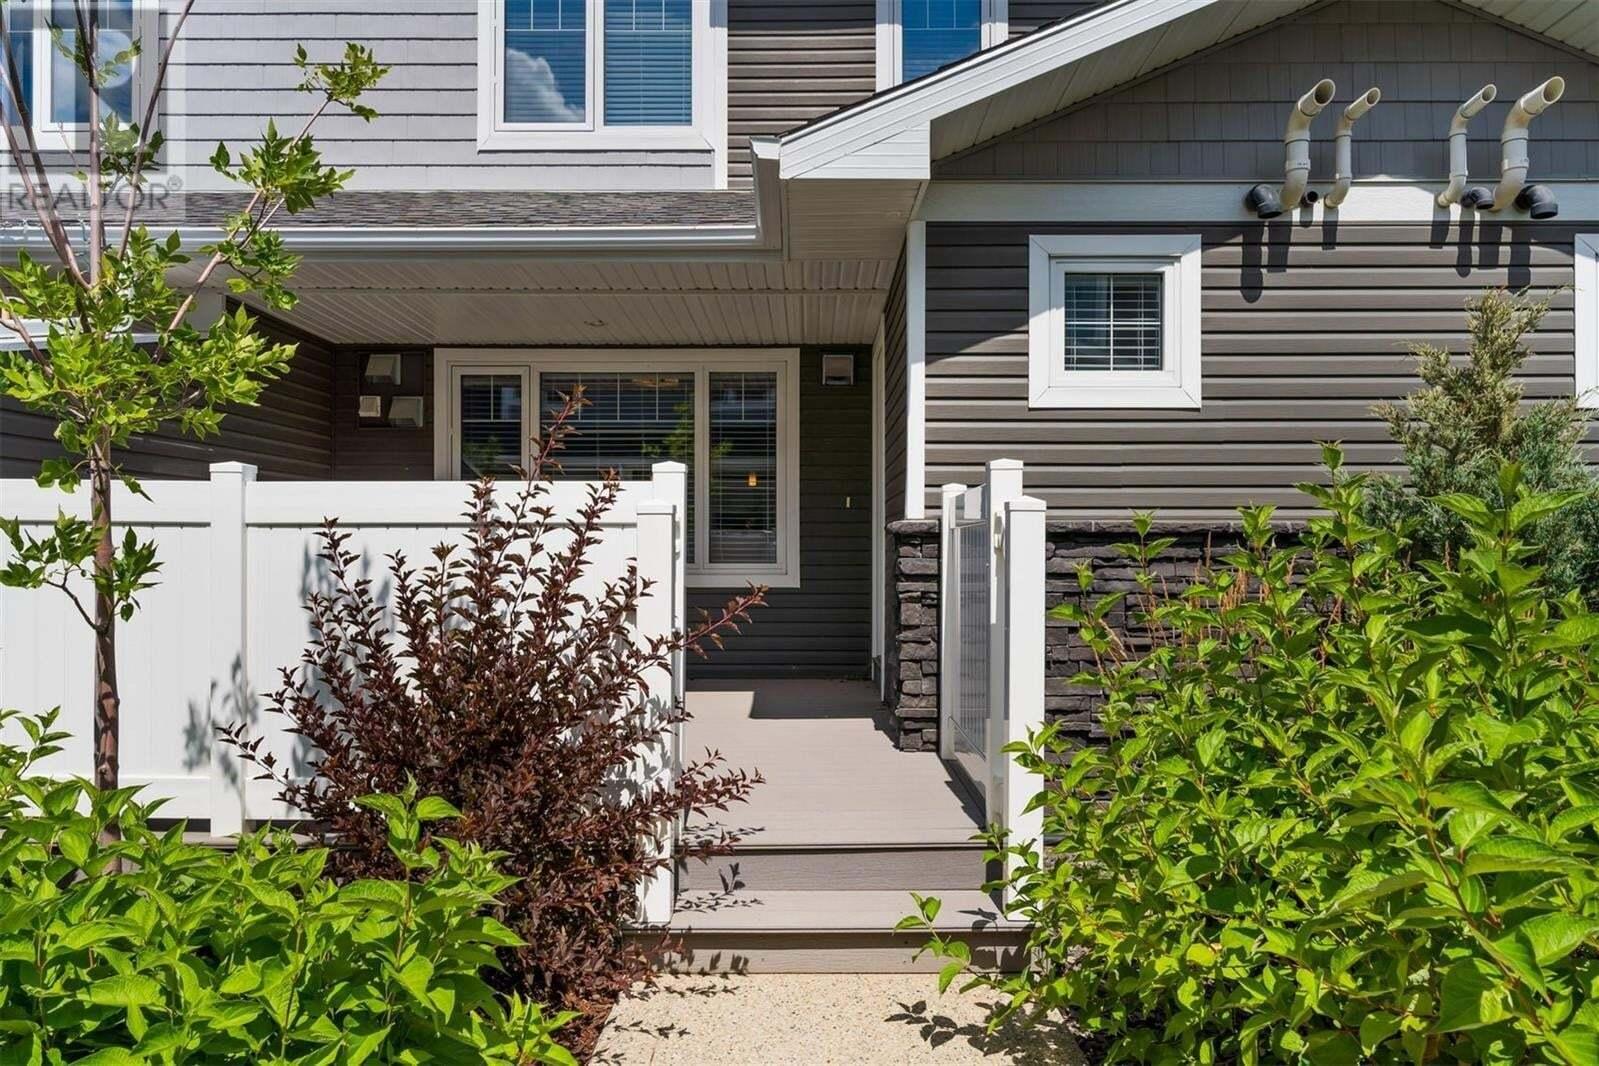 Townhouse for sale at 3463 Elgaard Dr Regina Saskatchewan - MLS: SK821516